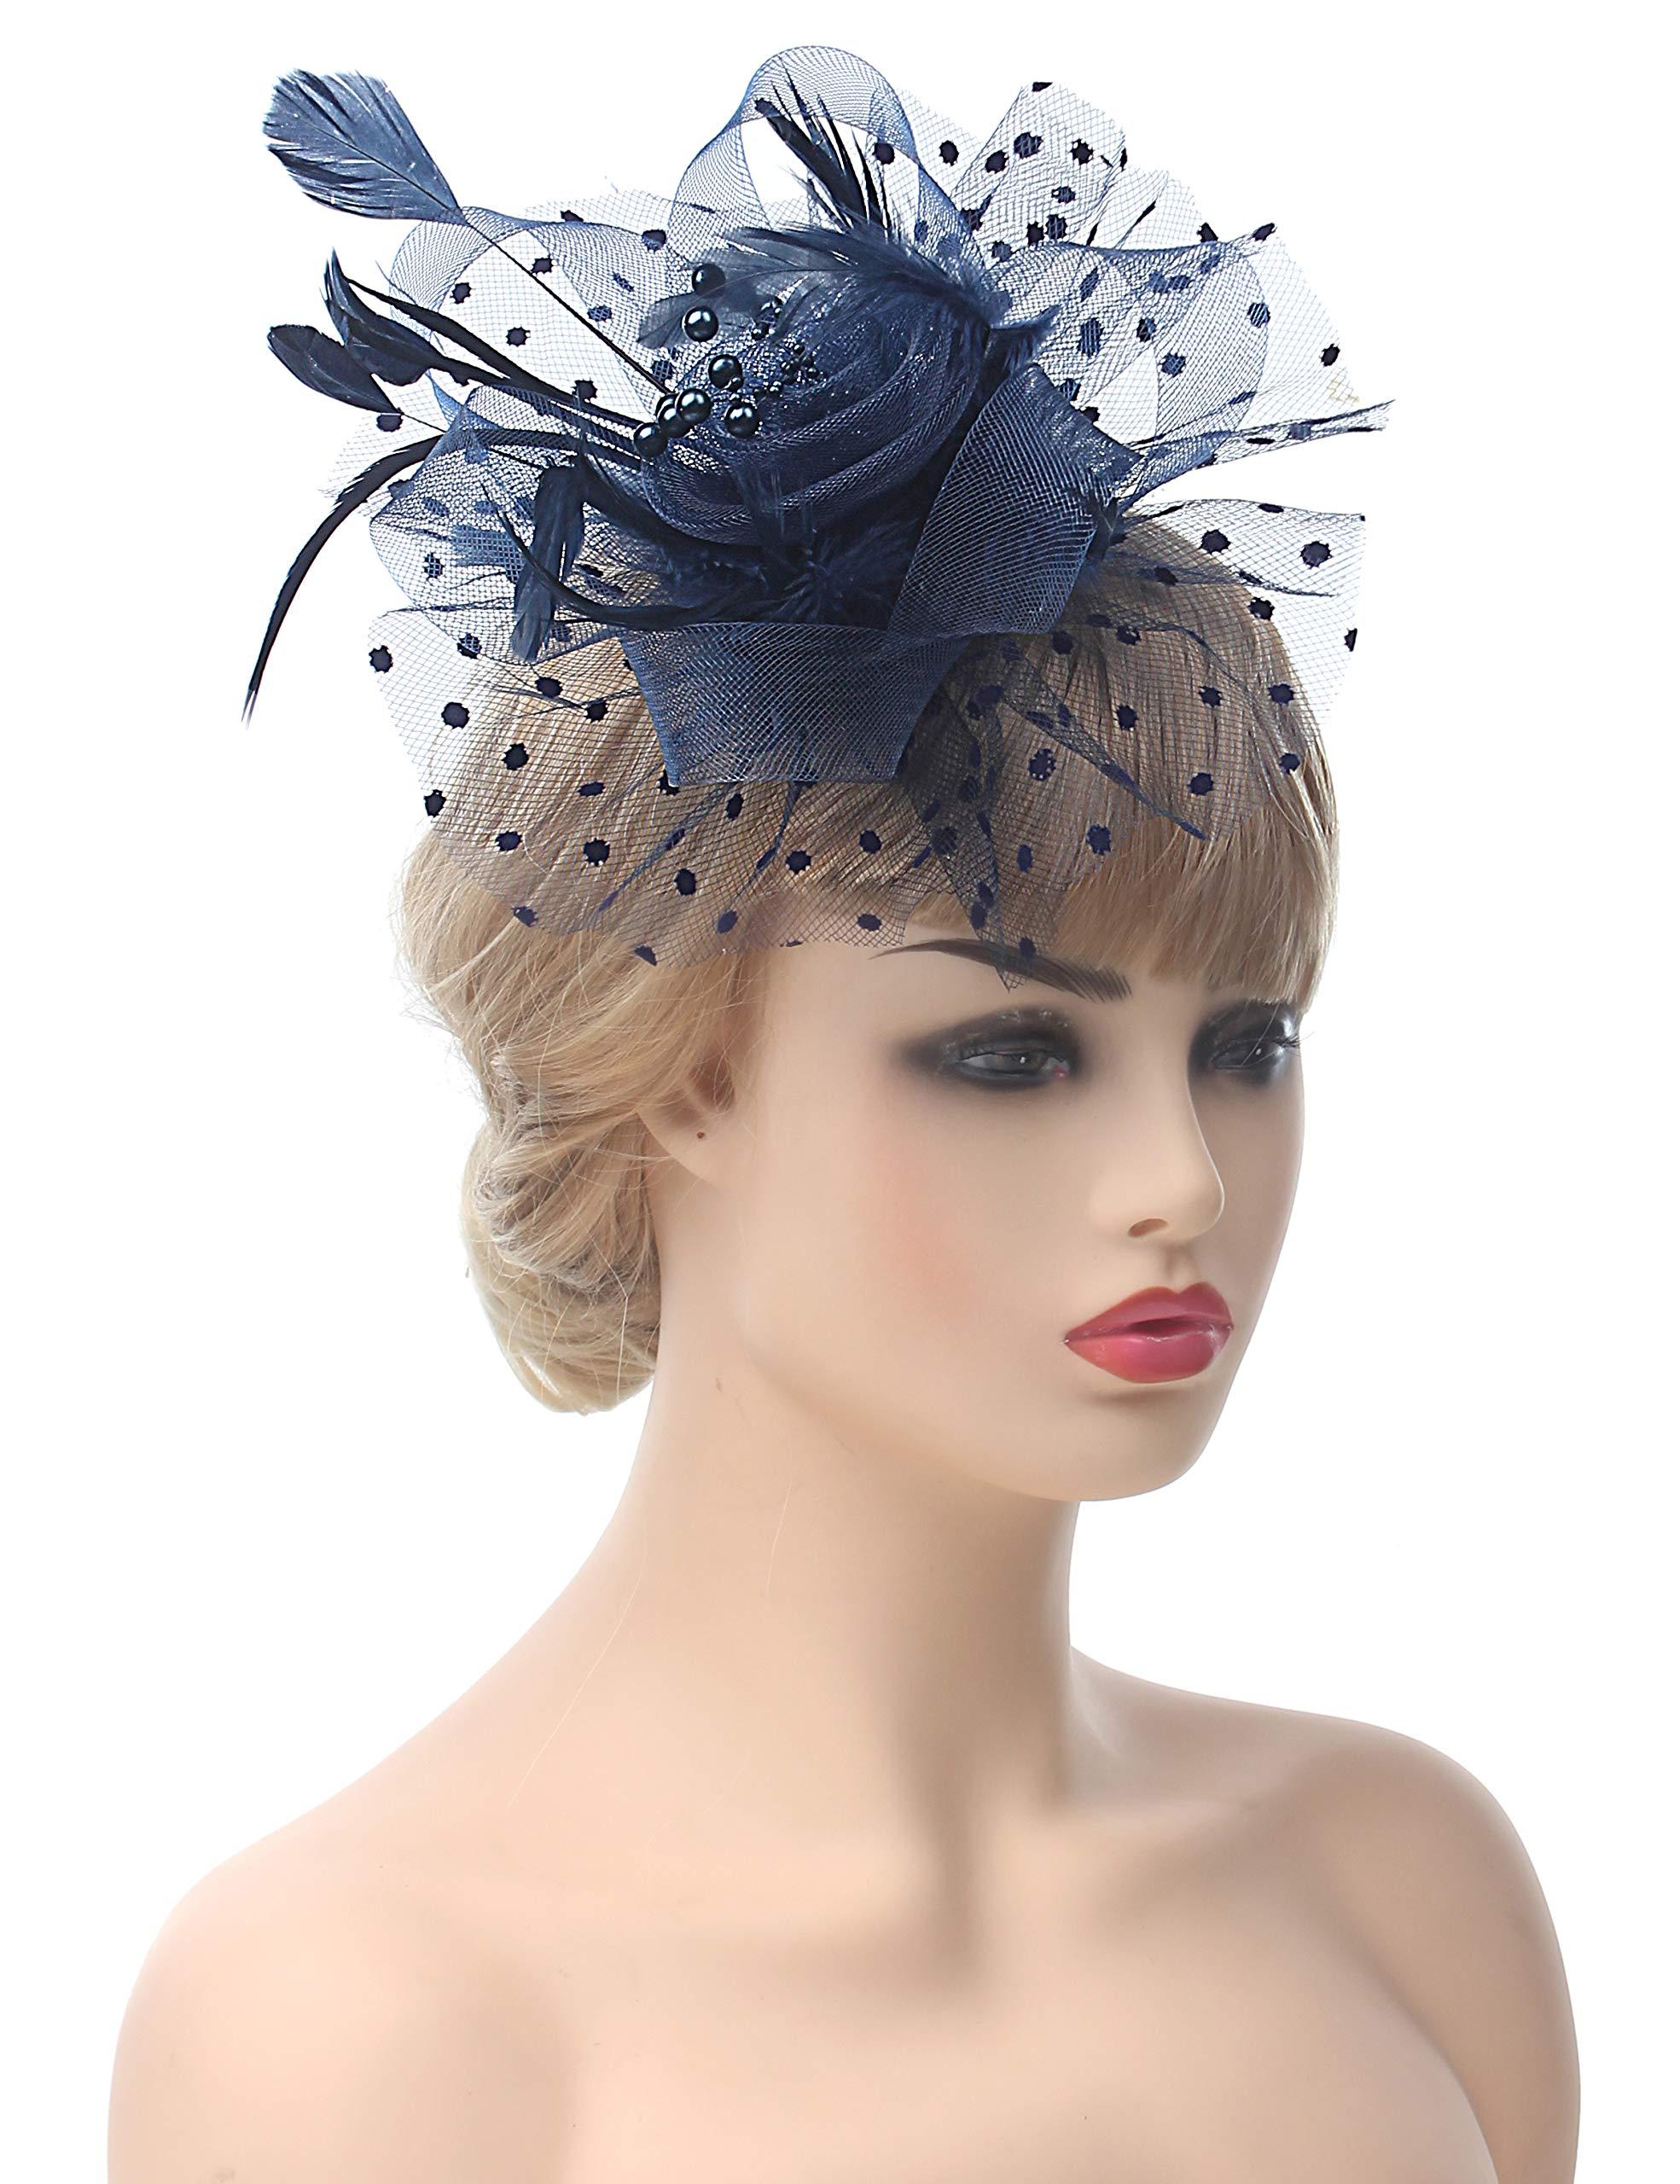 Myjoyday Fascinators Hat for Women Tea Party Headband Kentucky Derby Wedding Cocktail Flower Mesh Feathers Hair Clip (Navy Blue)